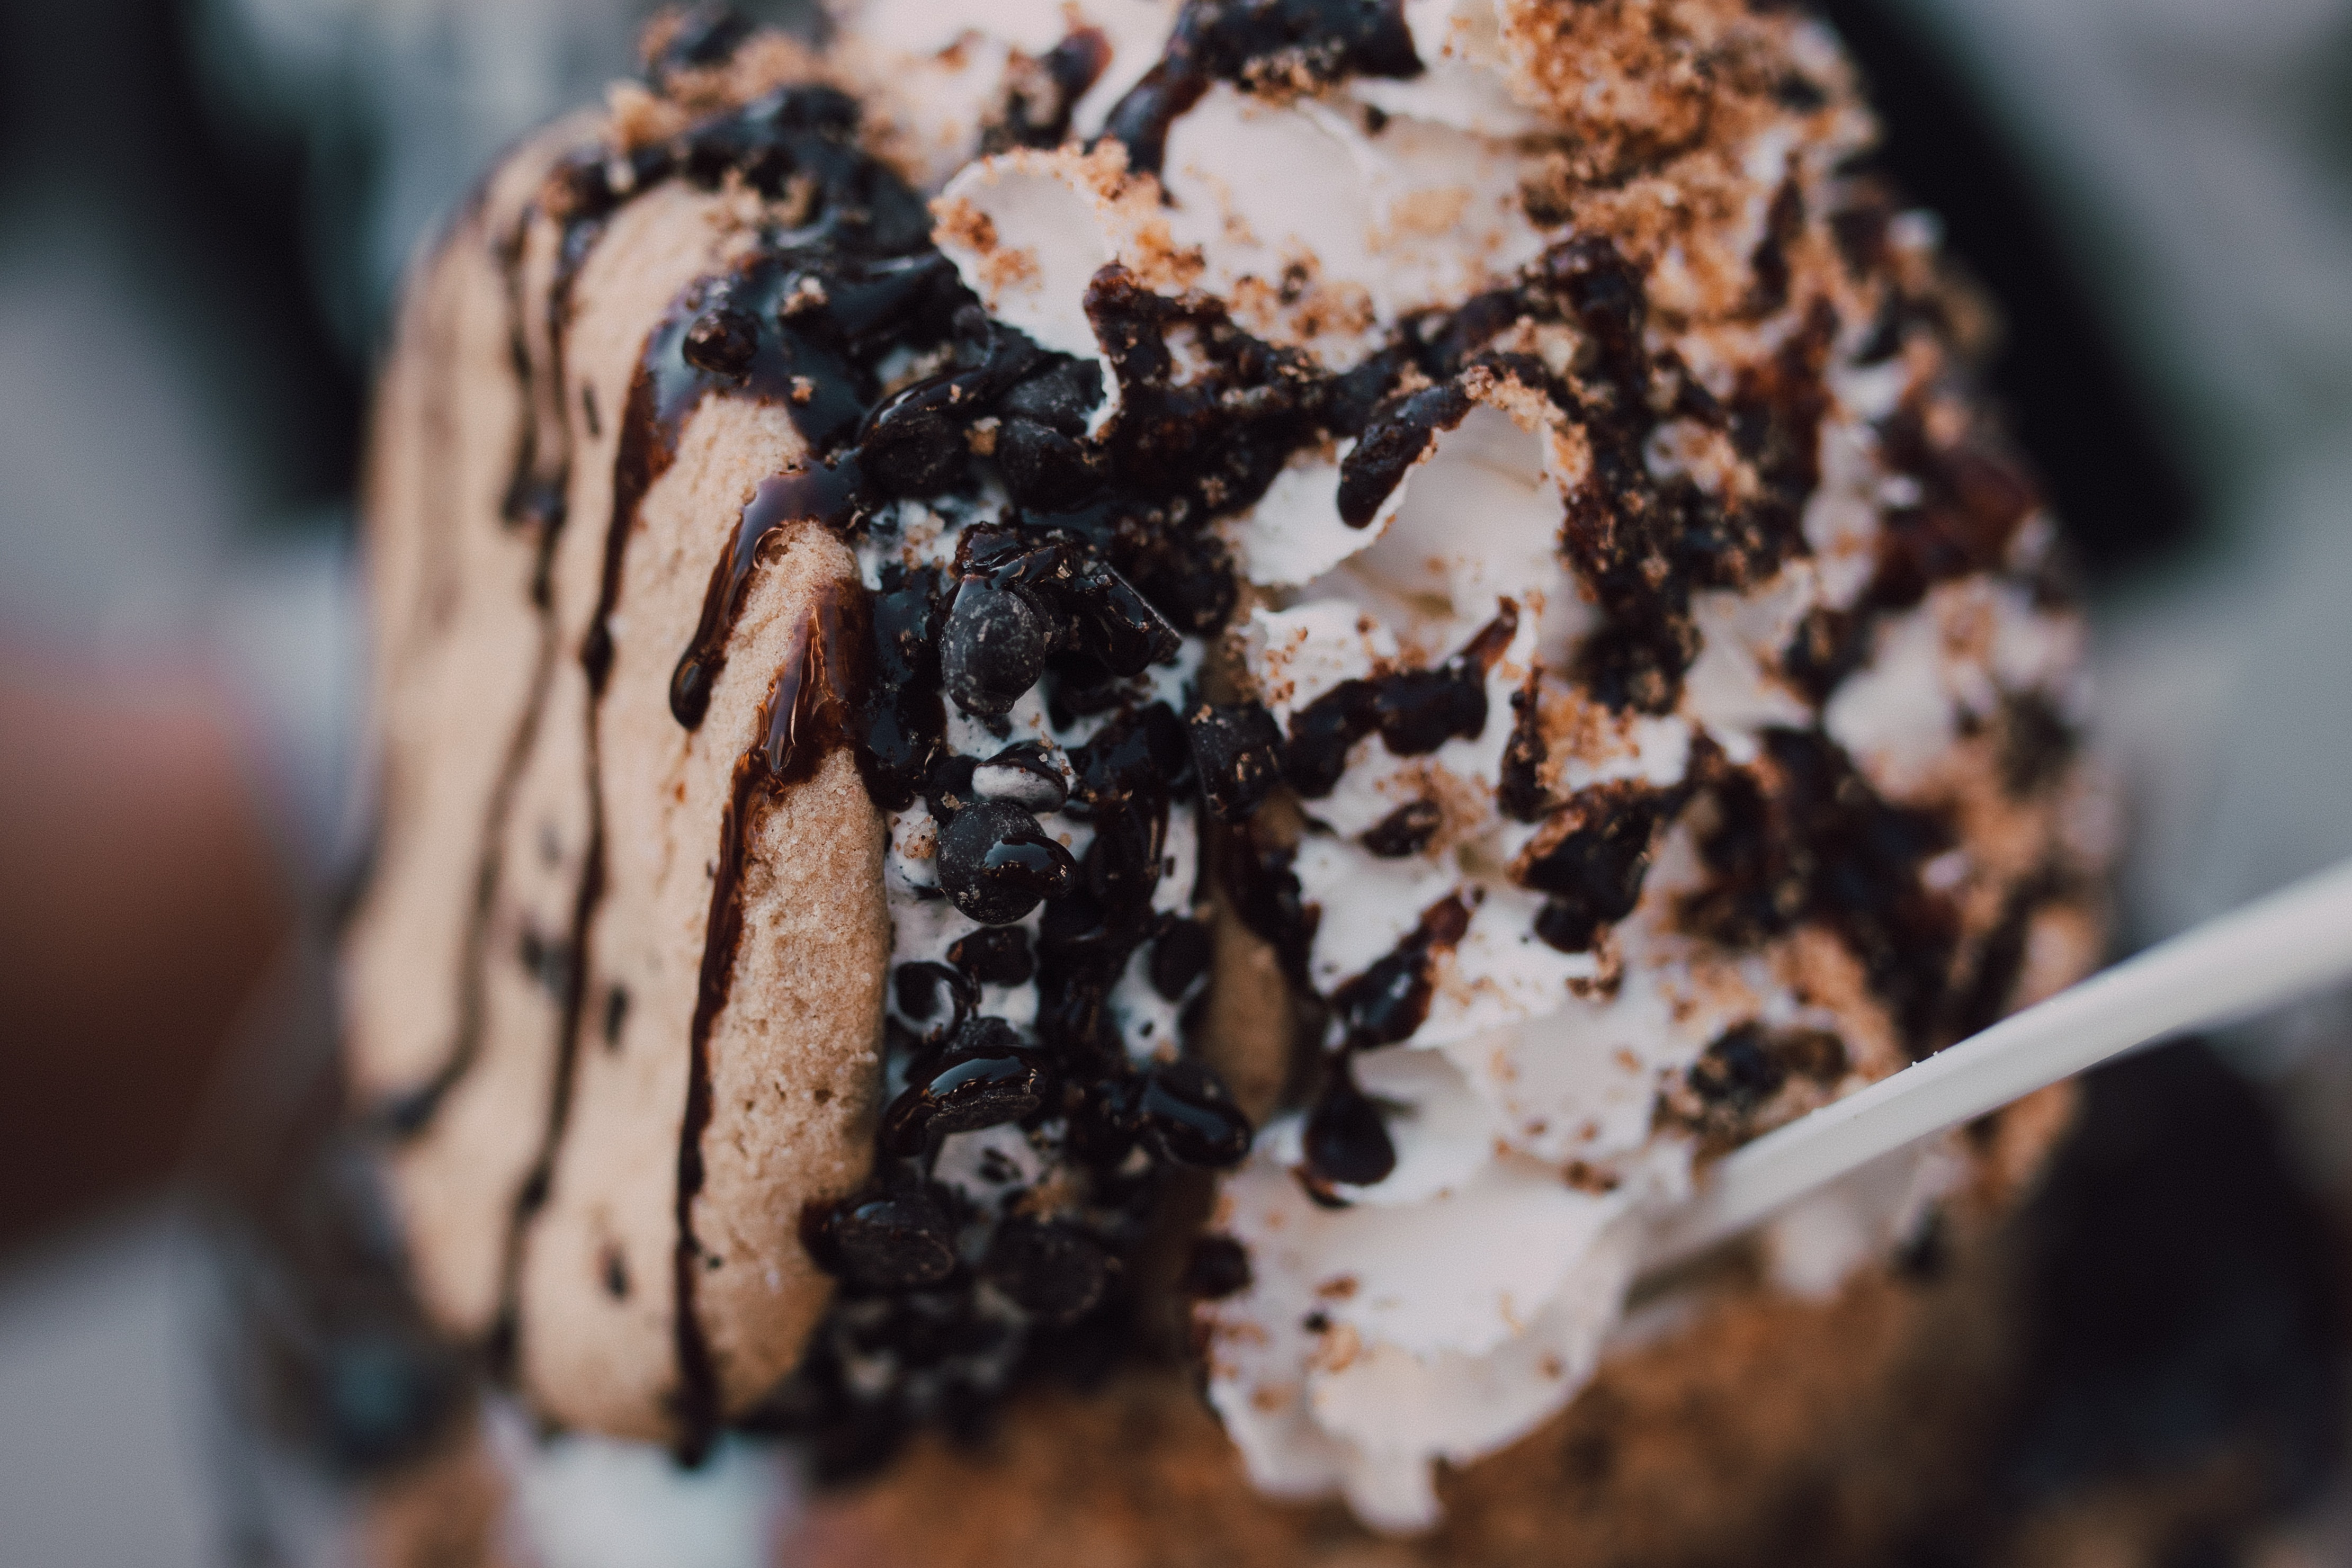 sorvetes saudáveis